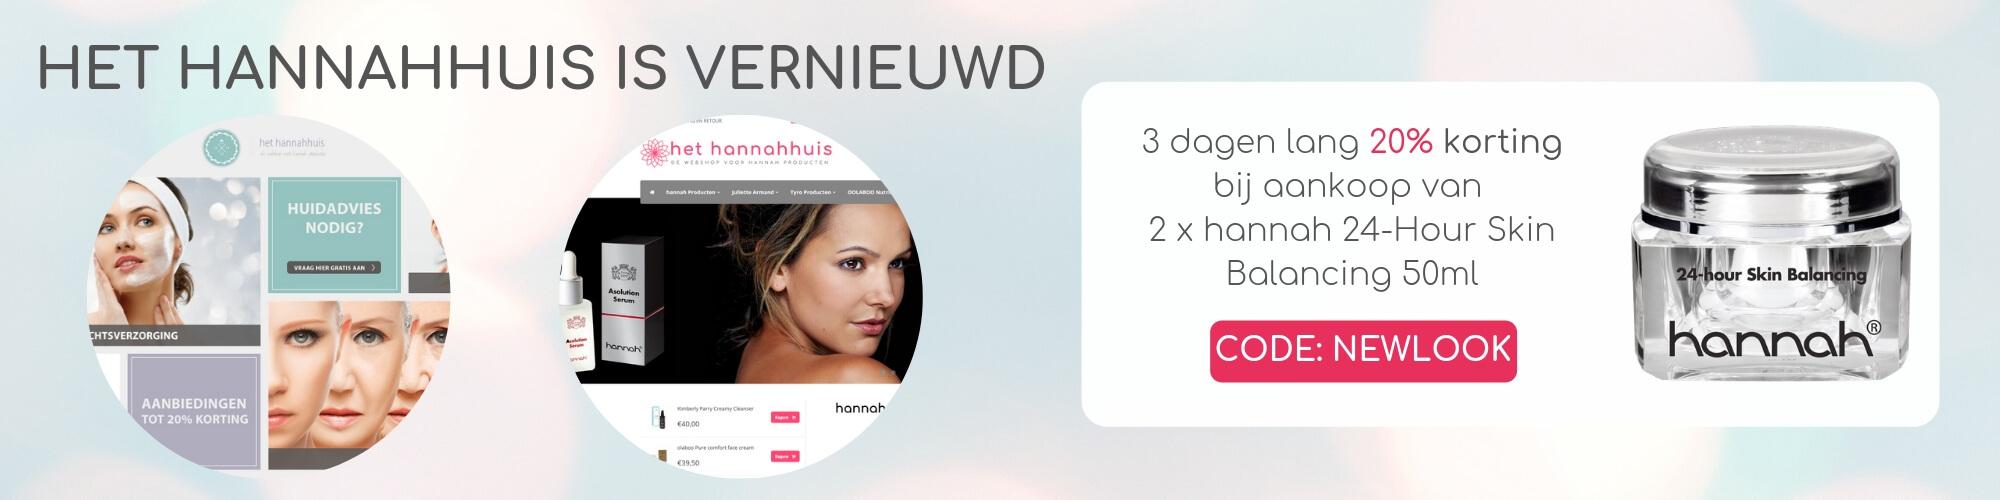 Huidverzorgings webshop banner 1